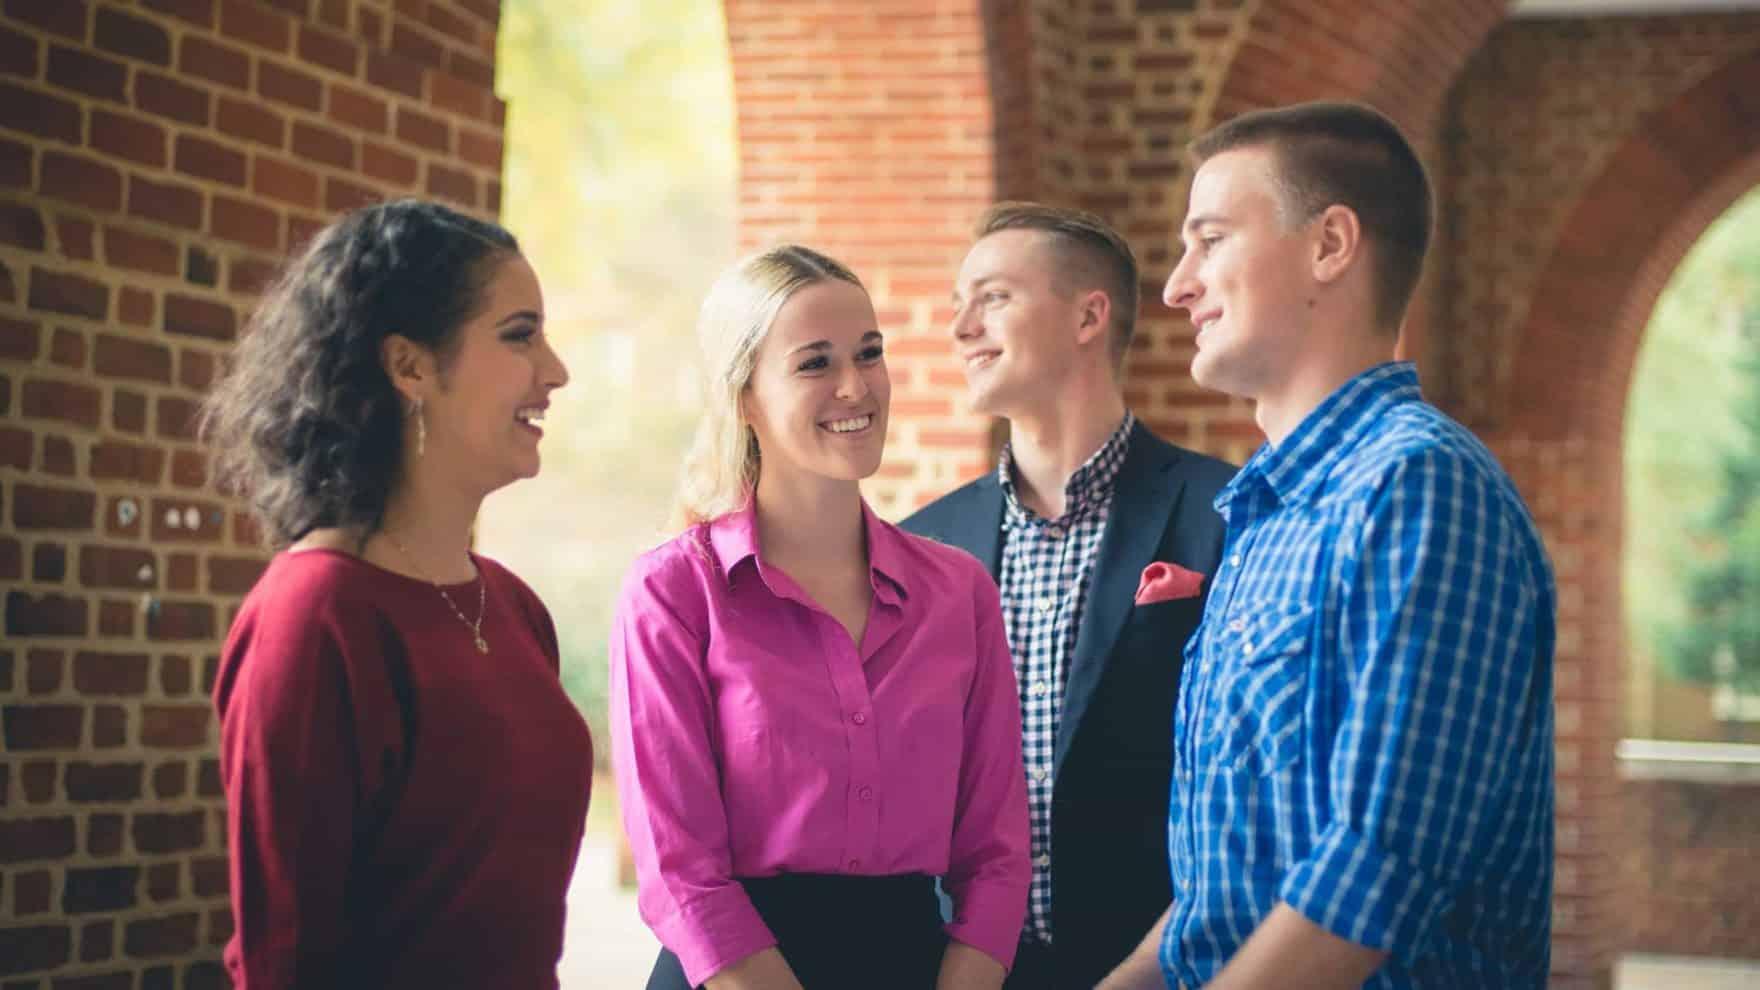 Regent University Students On Campus talking